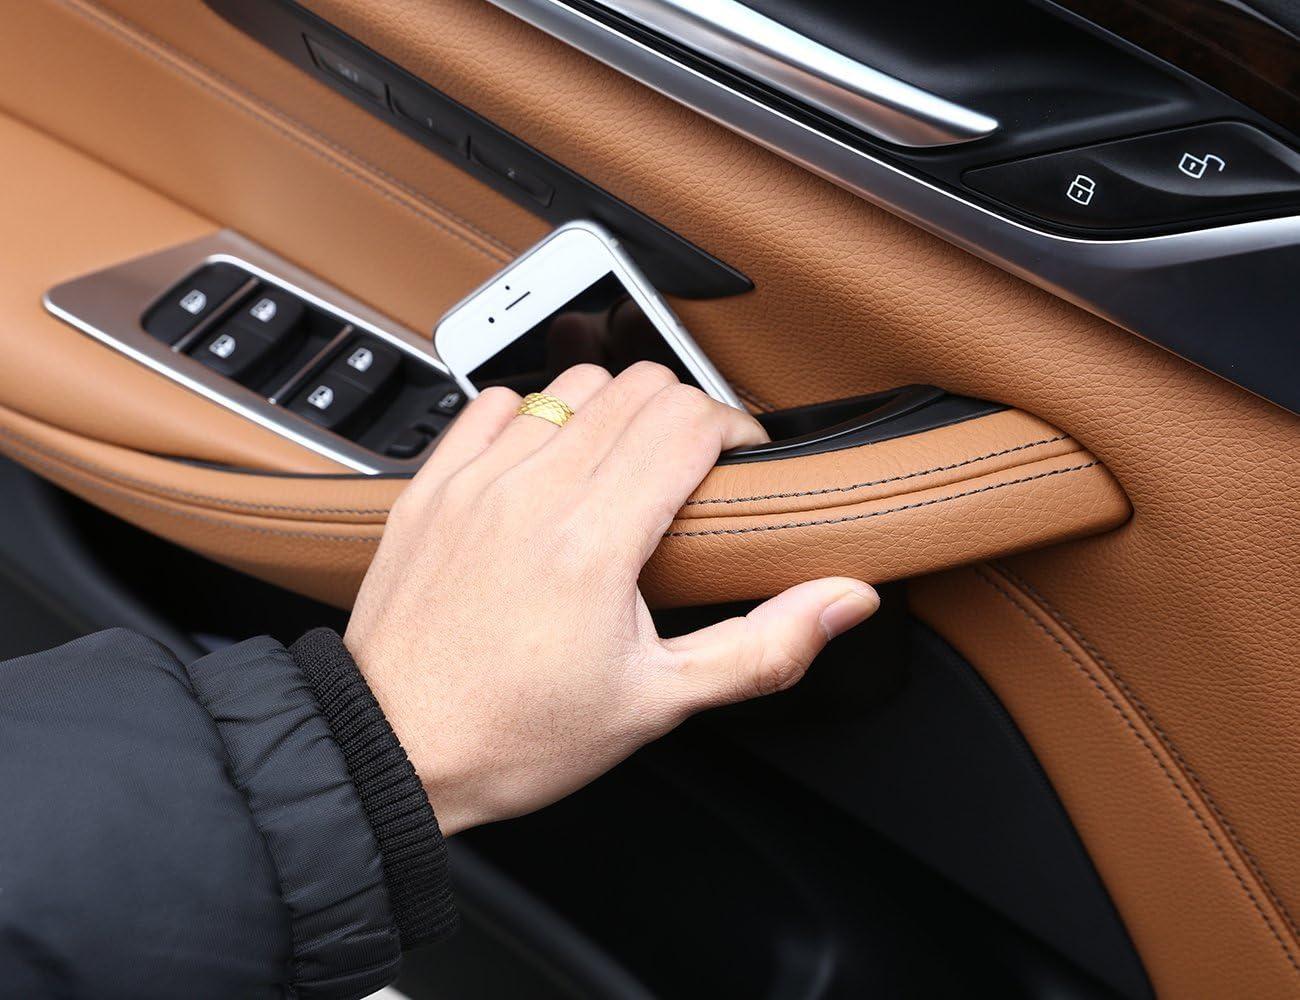 2PC front door Car Door Storage Box Phone Tray Accessories For BMW 5 Series G30 2018